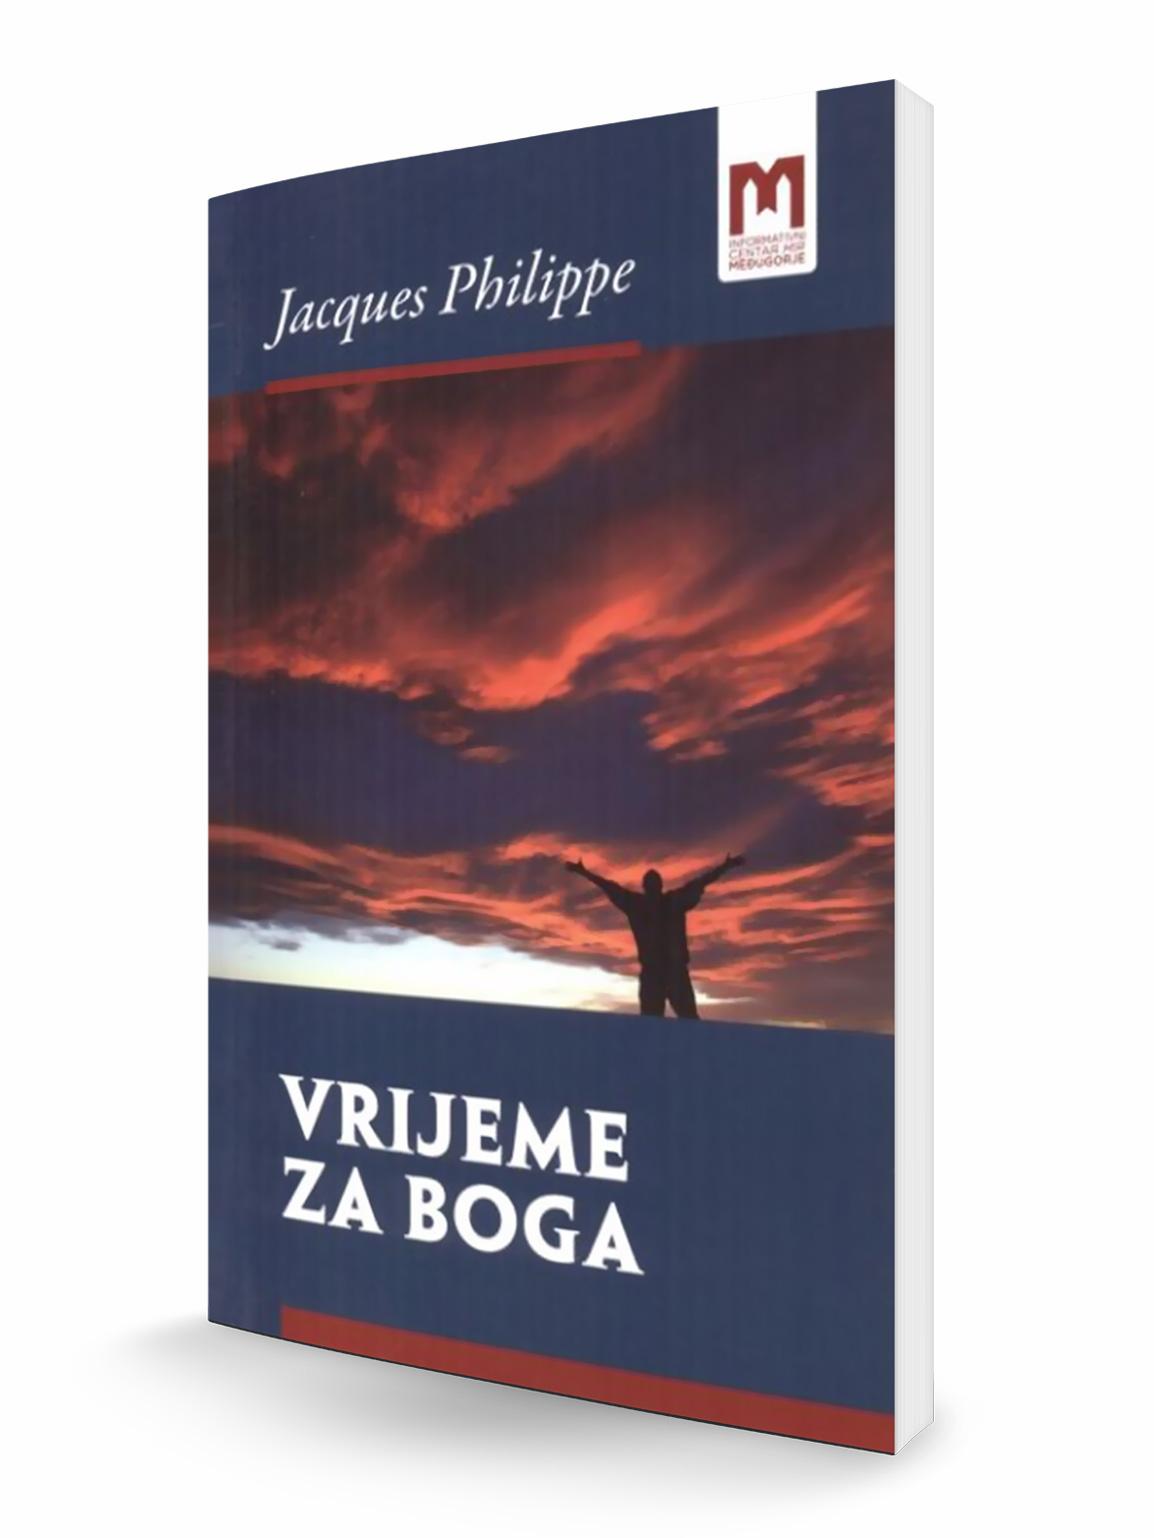 VRIJEME JE ZA BOGA - Jacques Philippe